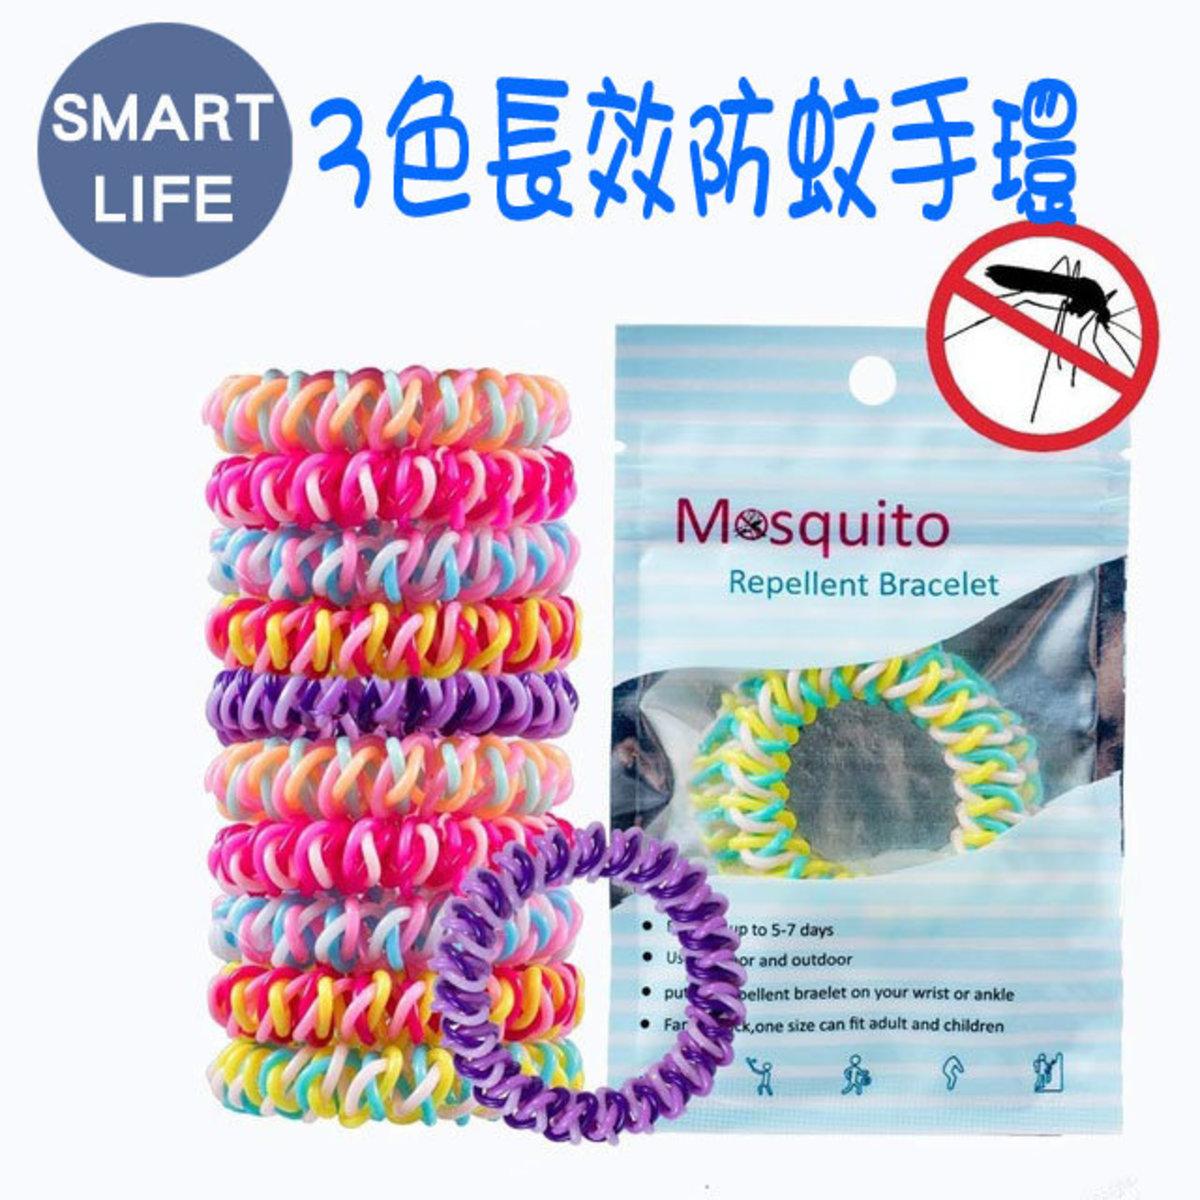 Tricolor Anti-mosquito Hand Strap / Bracelet (For infants and pregnant women) (Random Color)